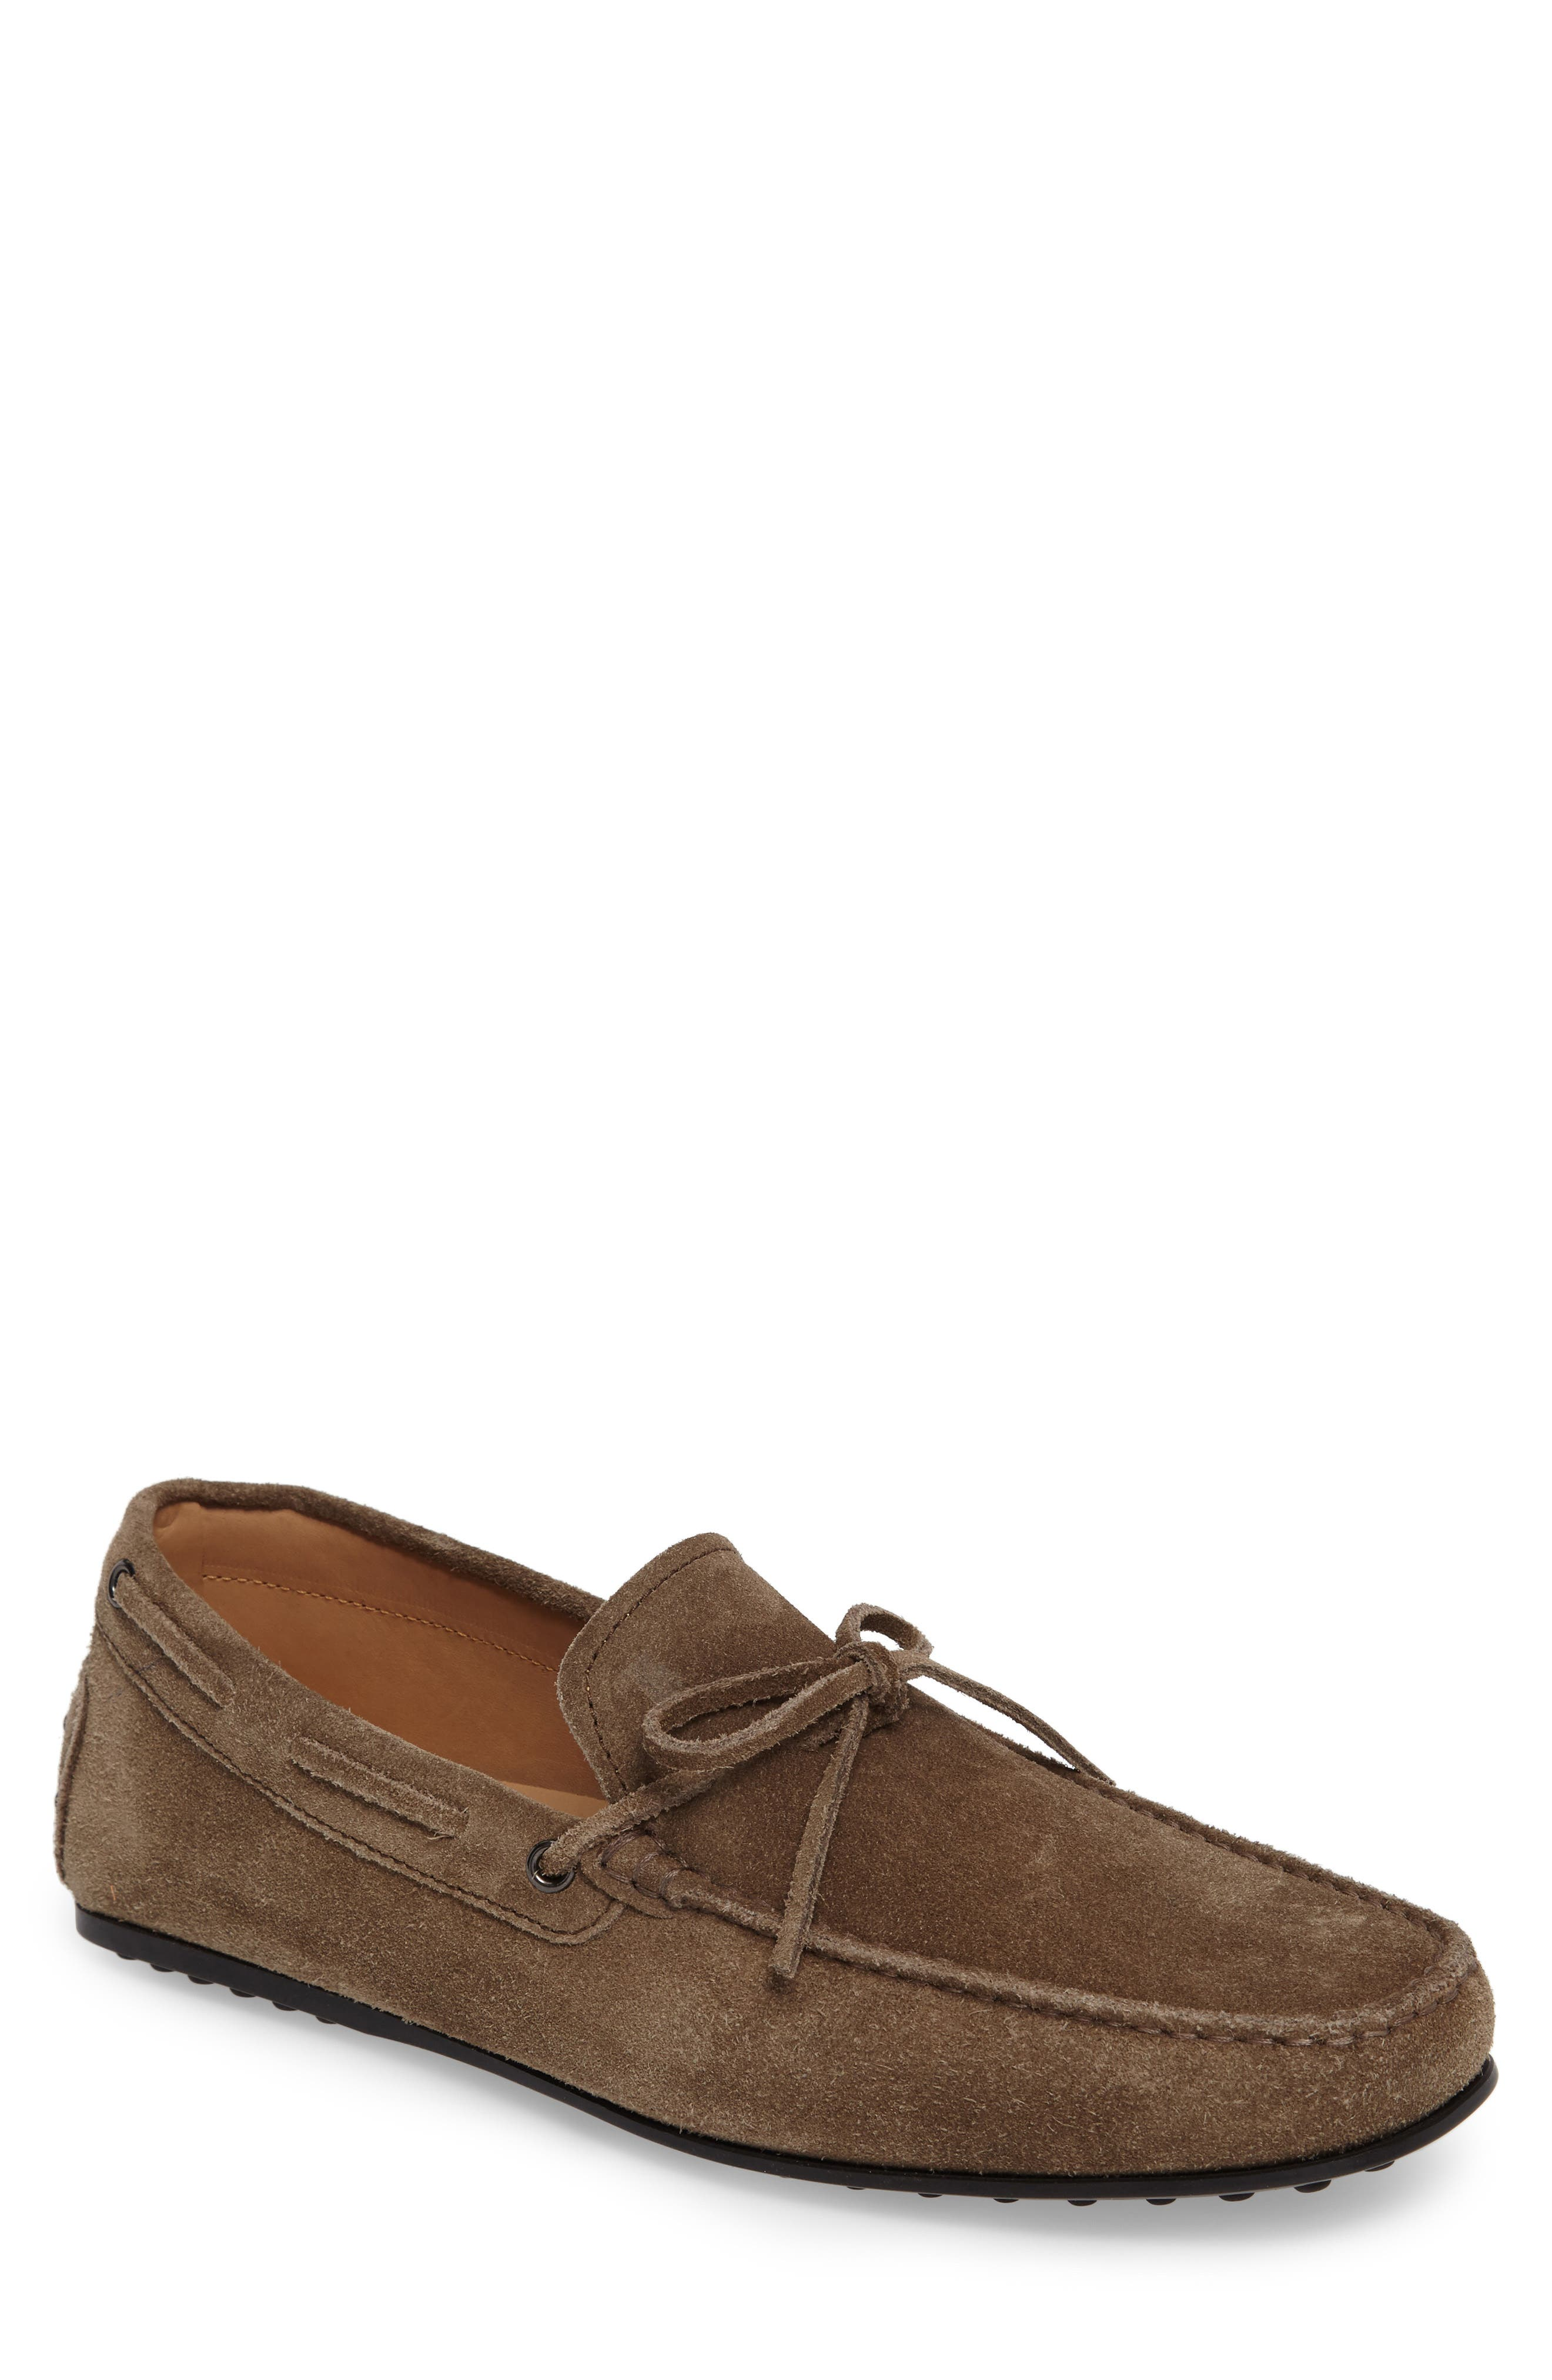 Tod's Gommino Driving Shoe (Men)